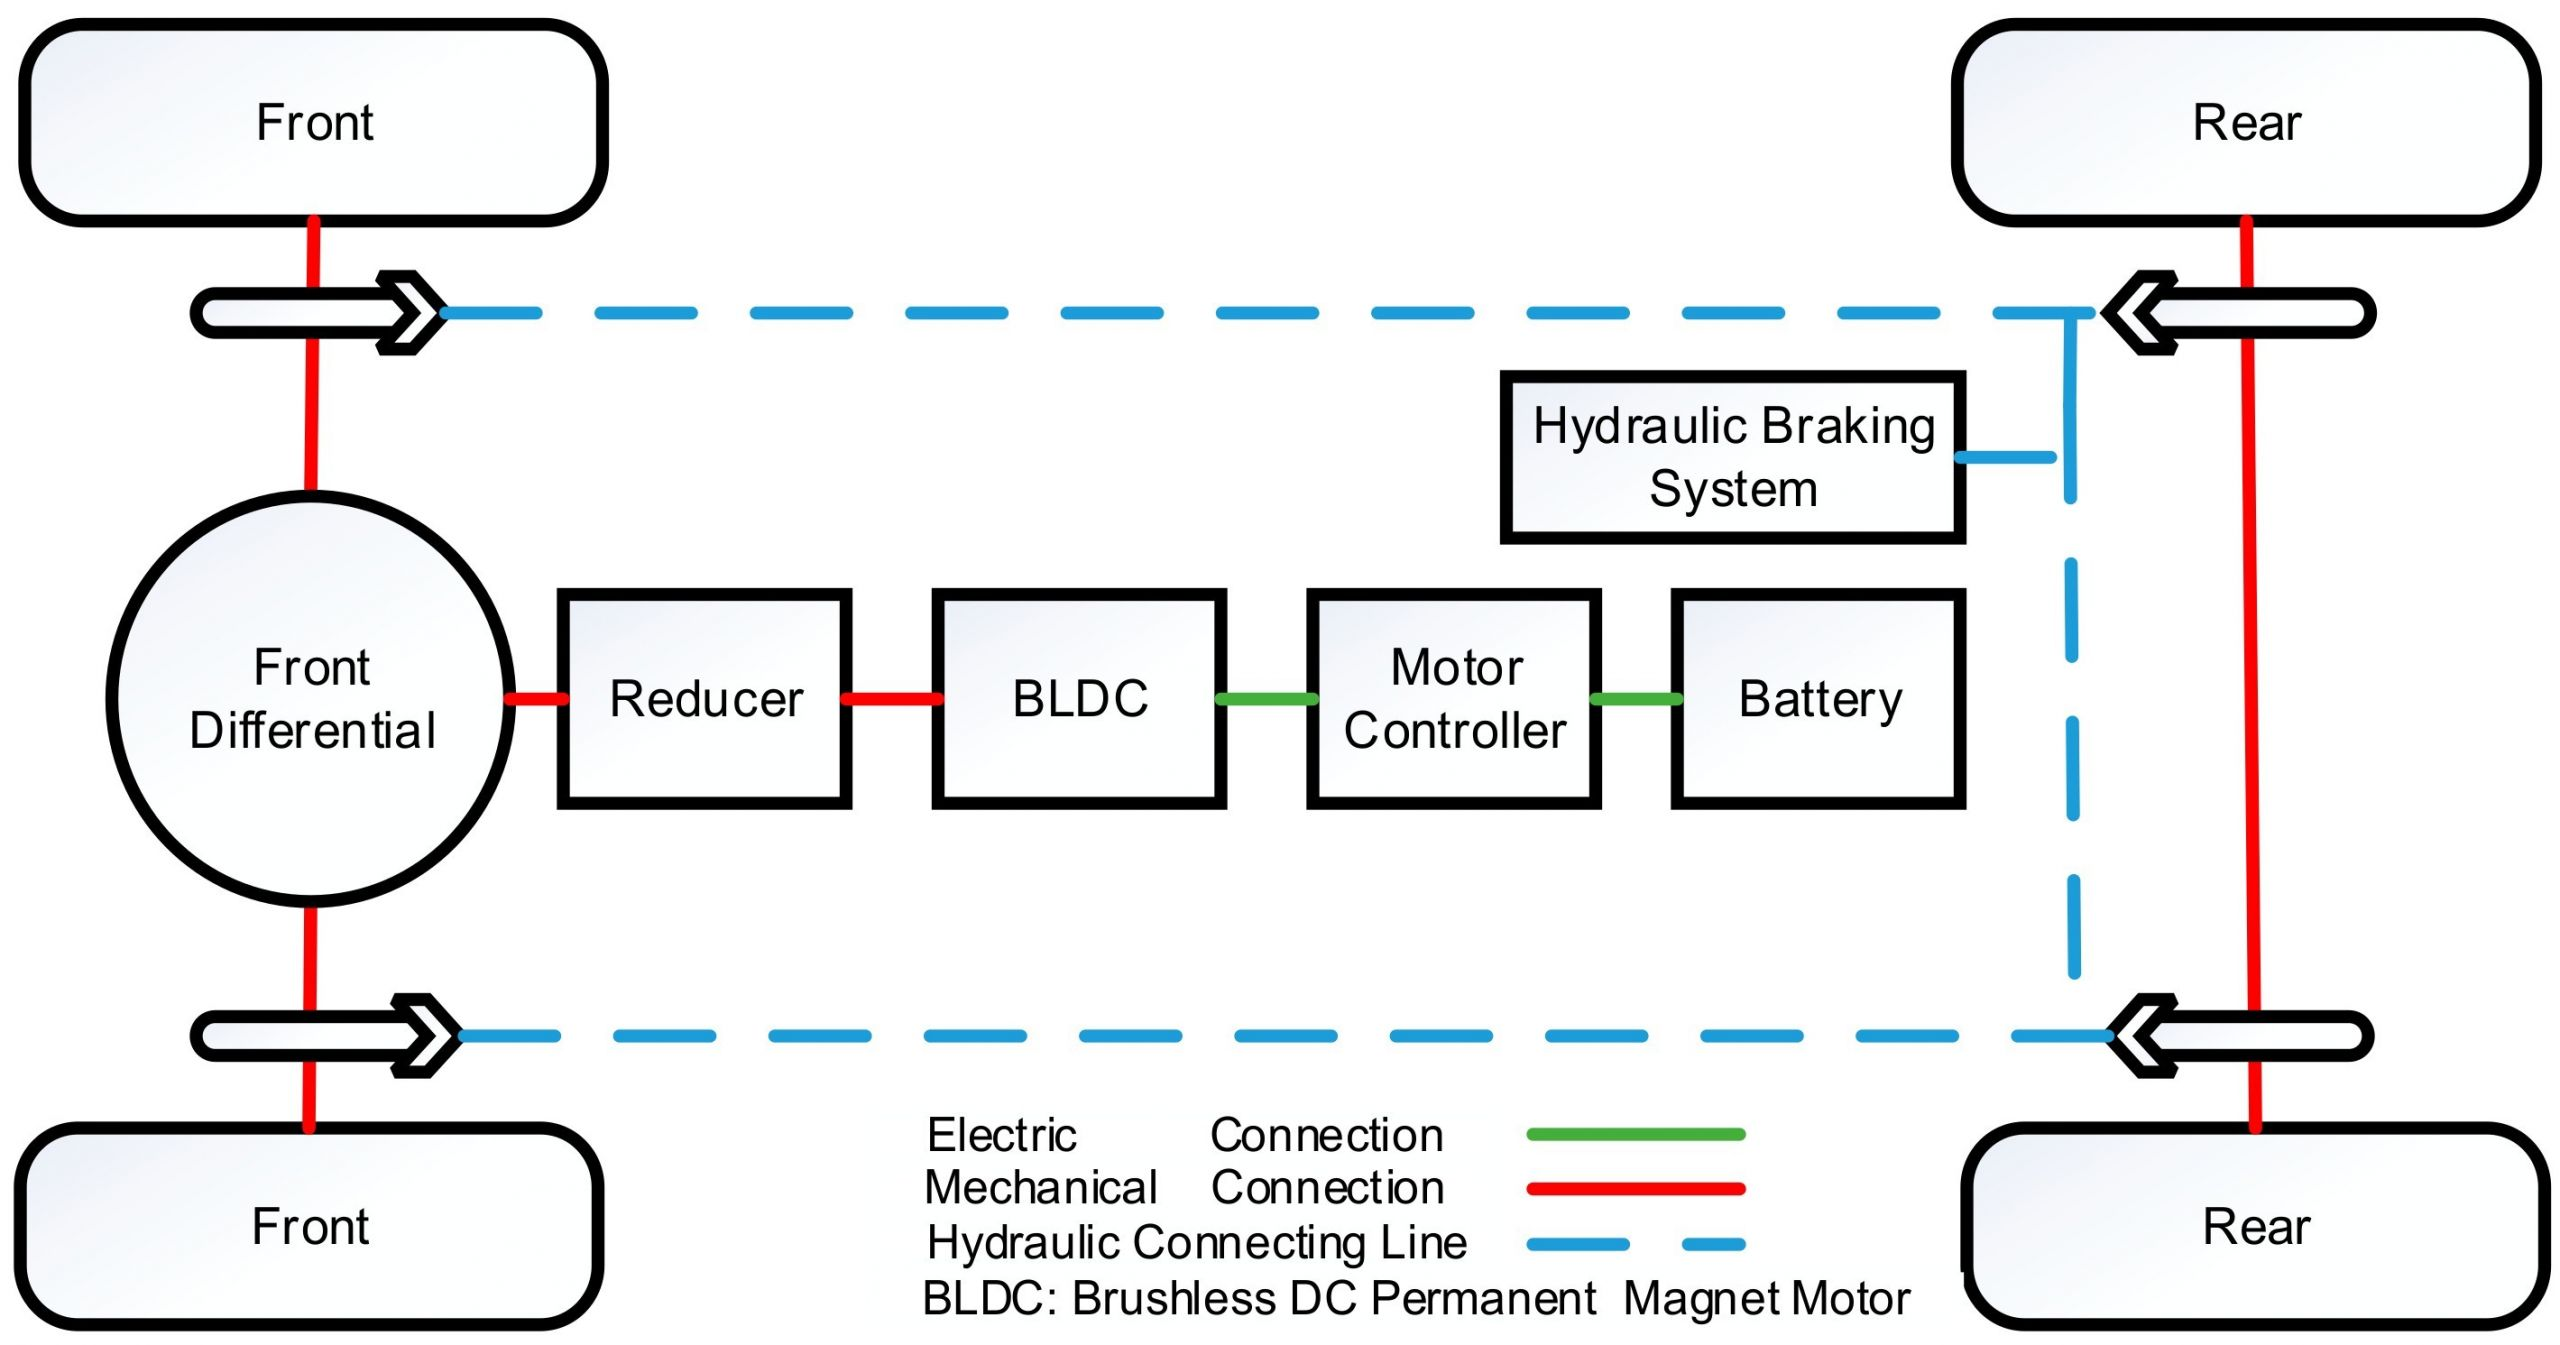 Regenerative Braking Diagram